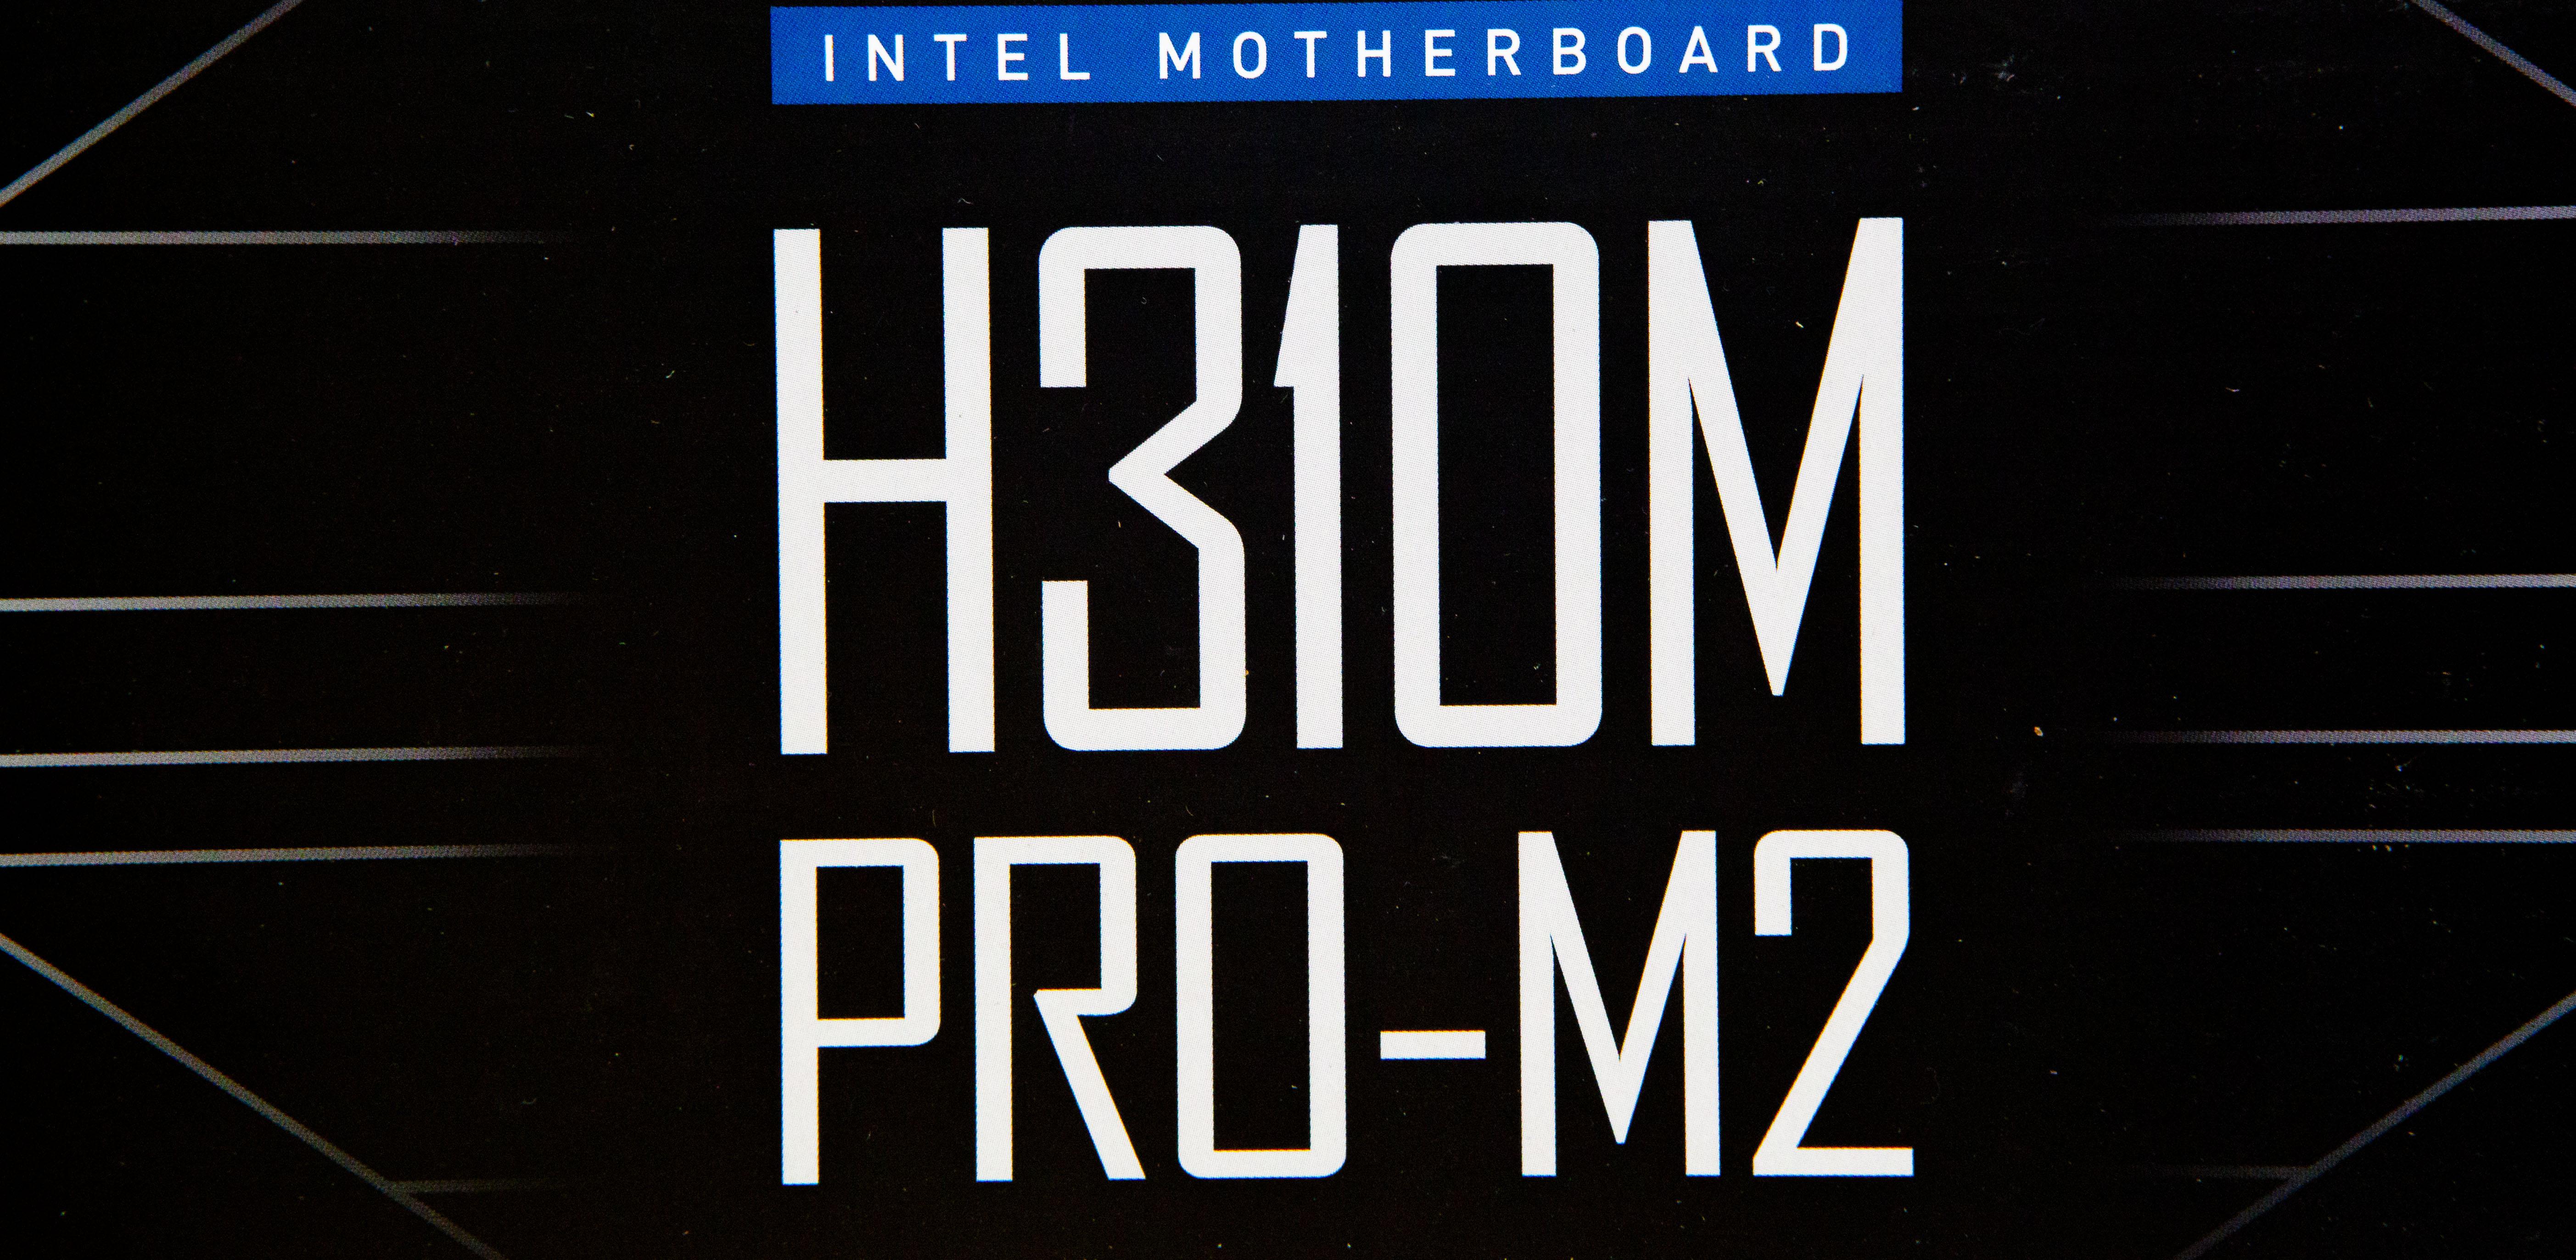 8th Generation Intel motherboard chipset guide - Novatech Blog